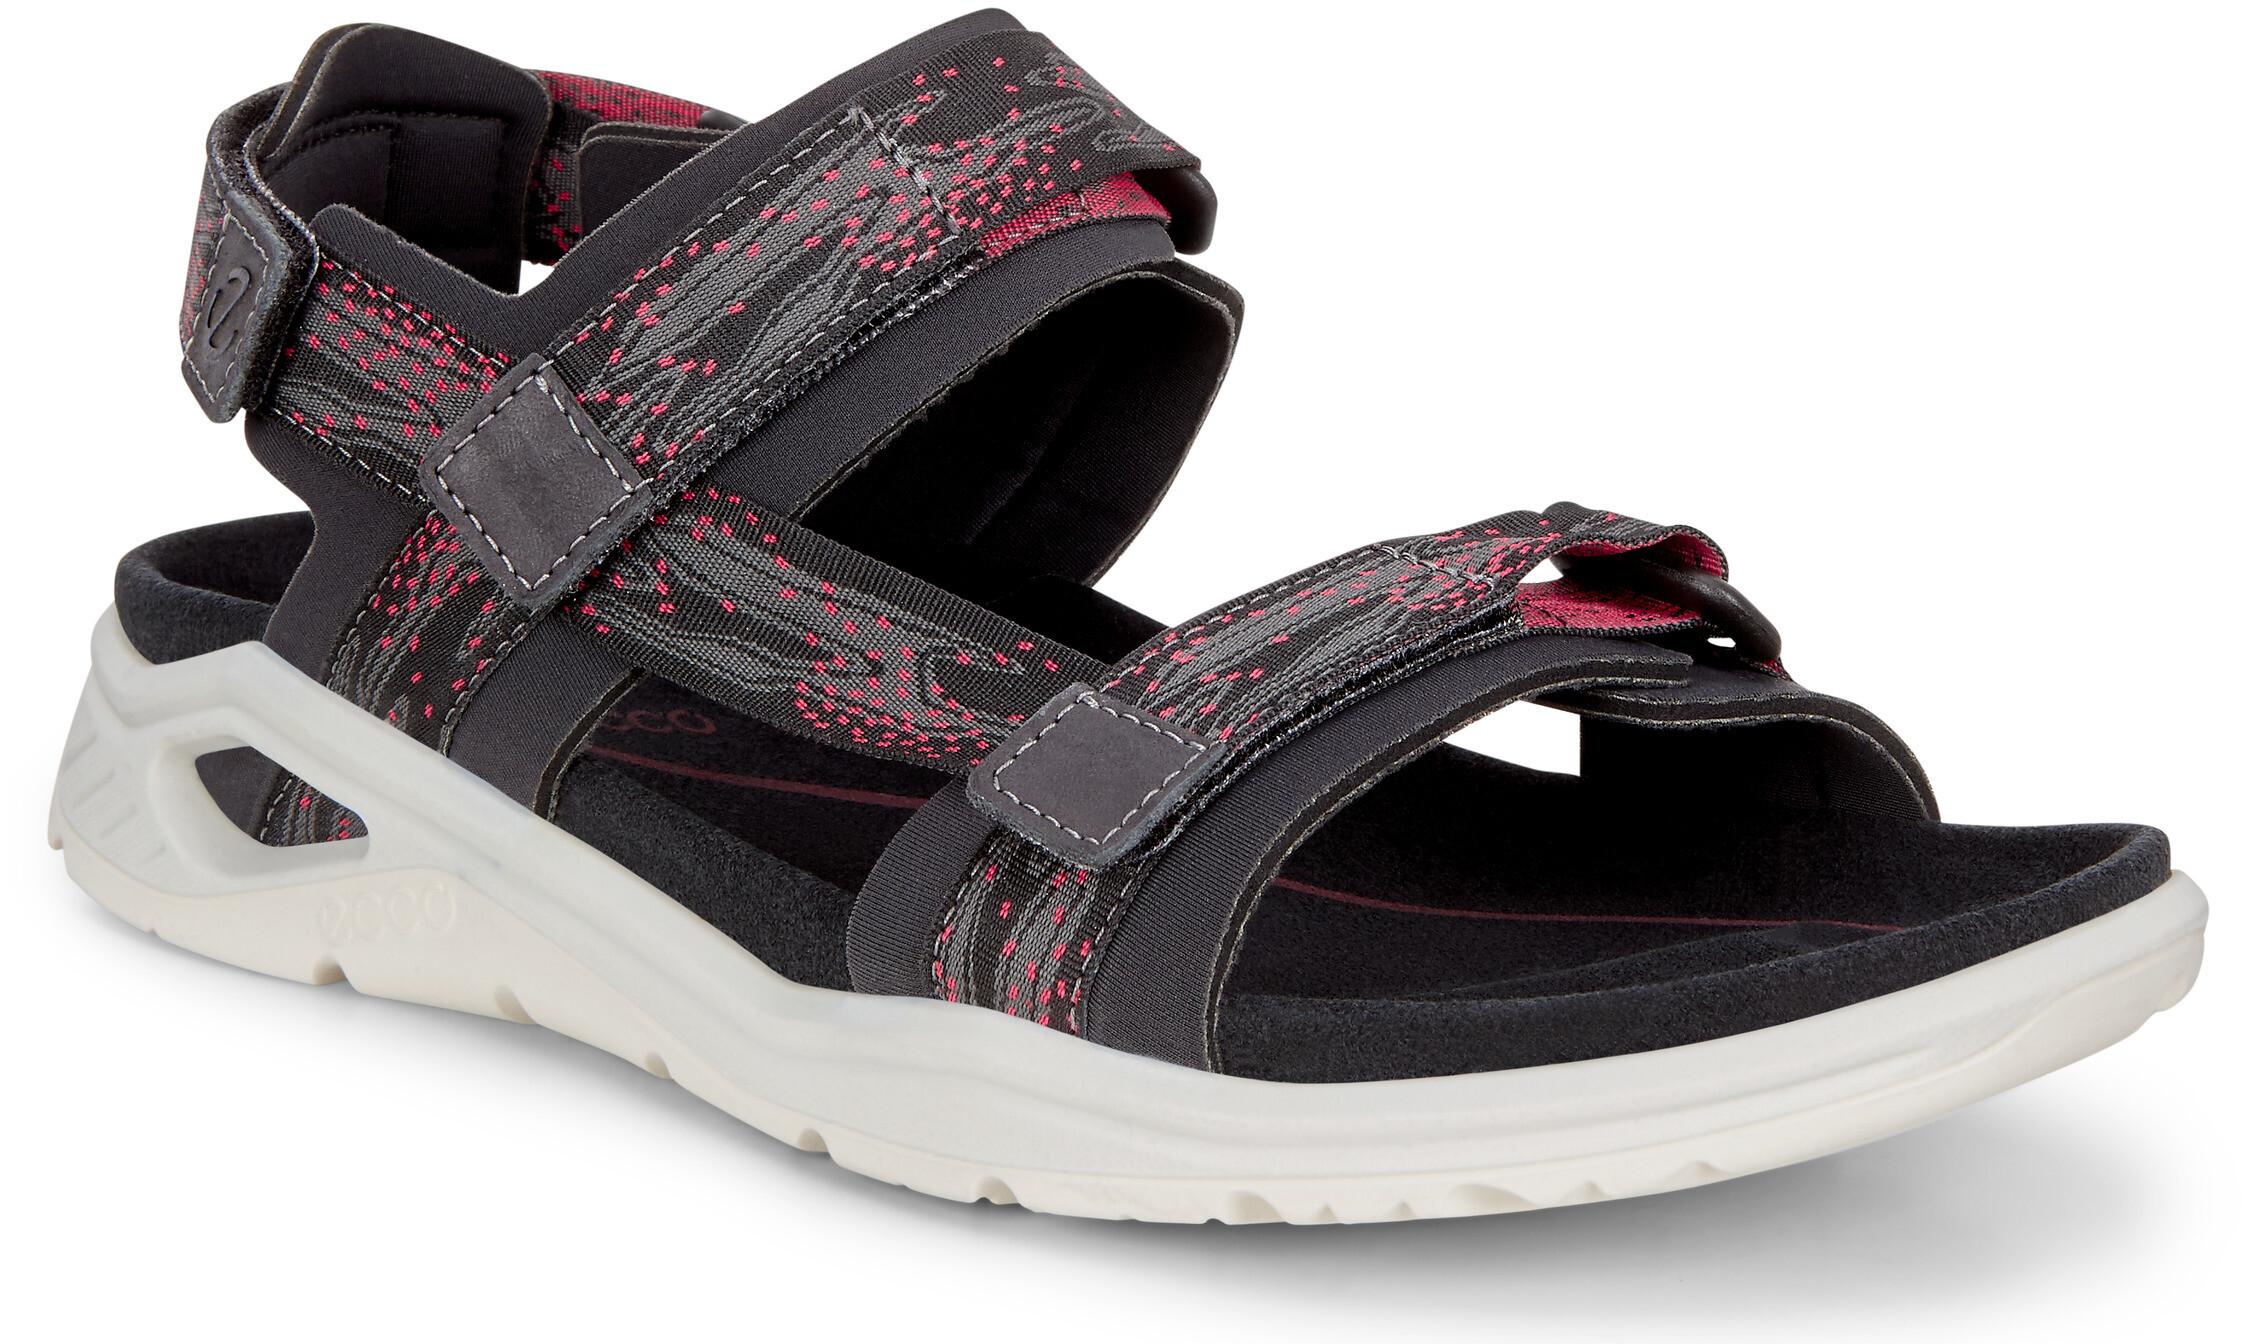 ae6f2320977dcb ECCO X-Trinsic Sandals Women black at Addnature.co.uk